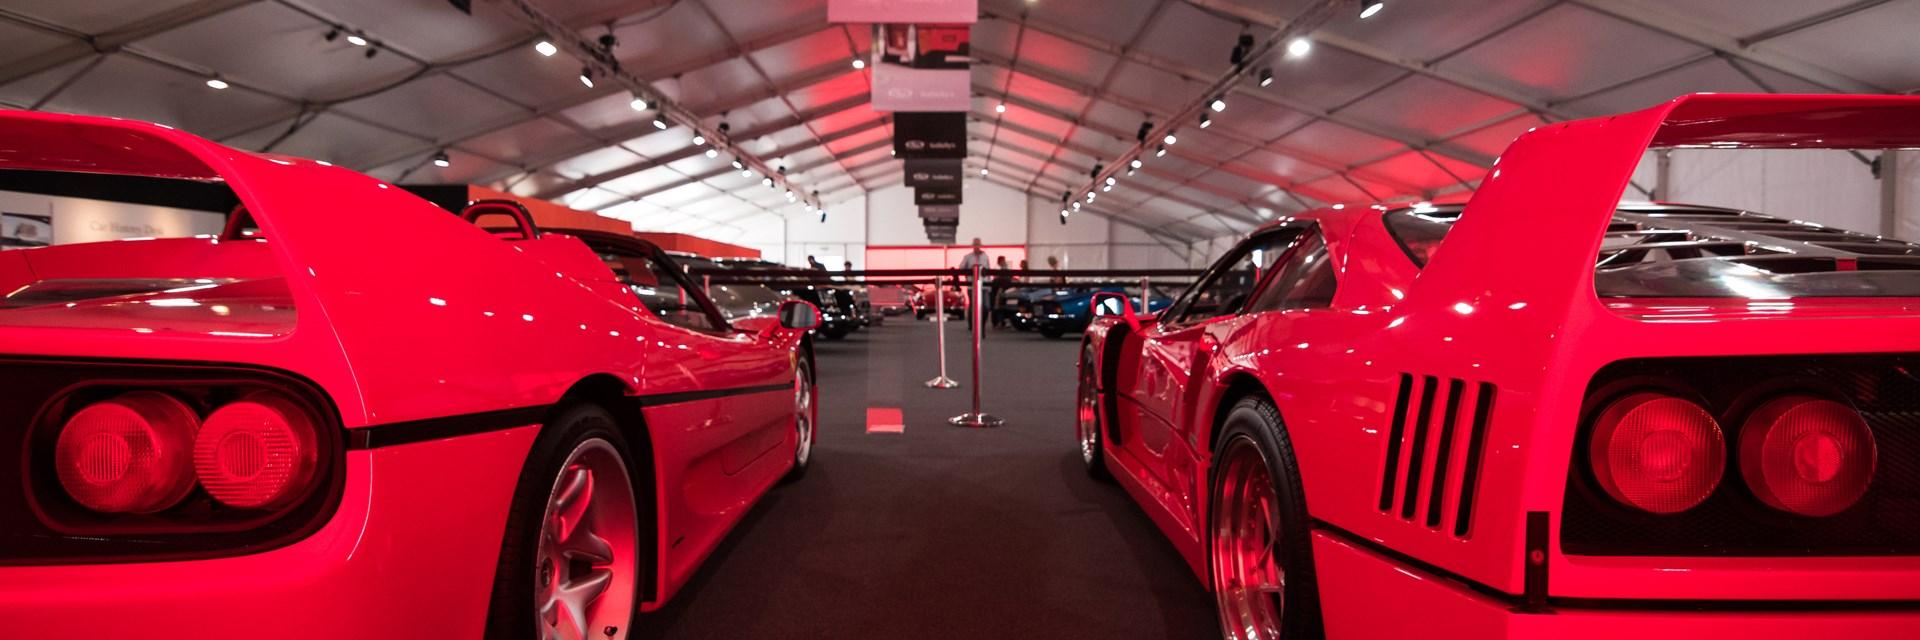 Ferrari – Leggenda e Passione